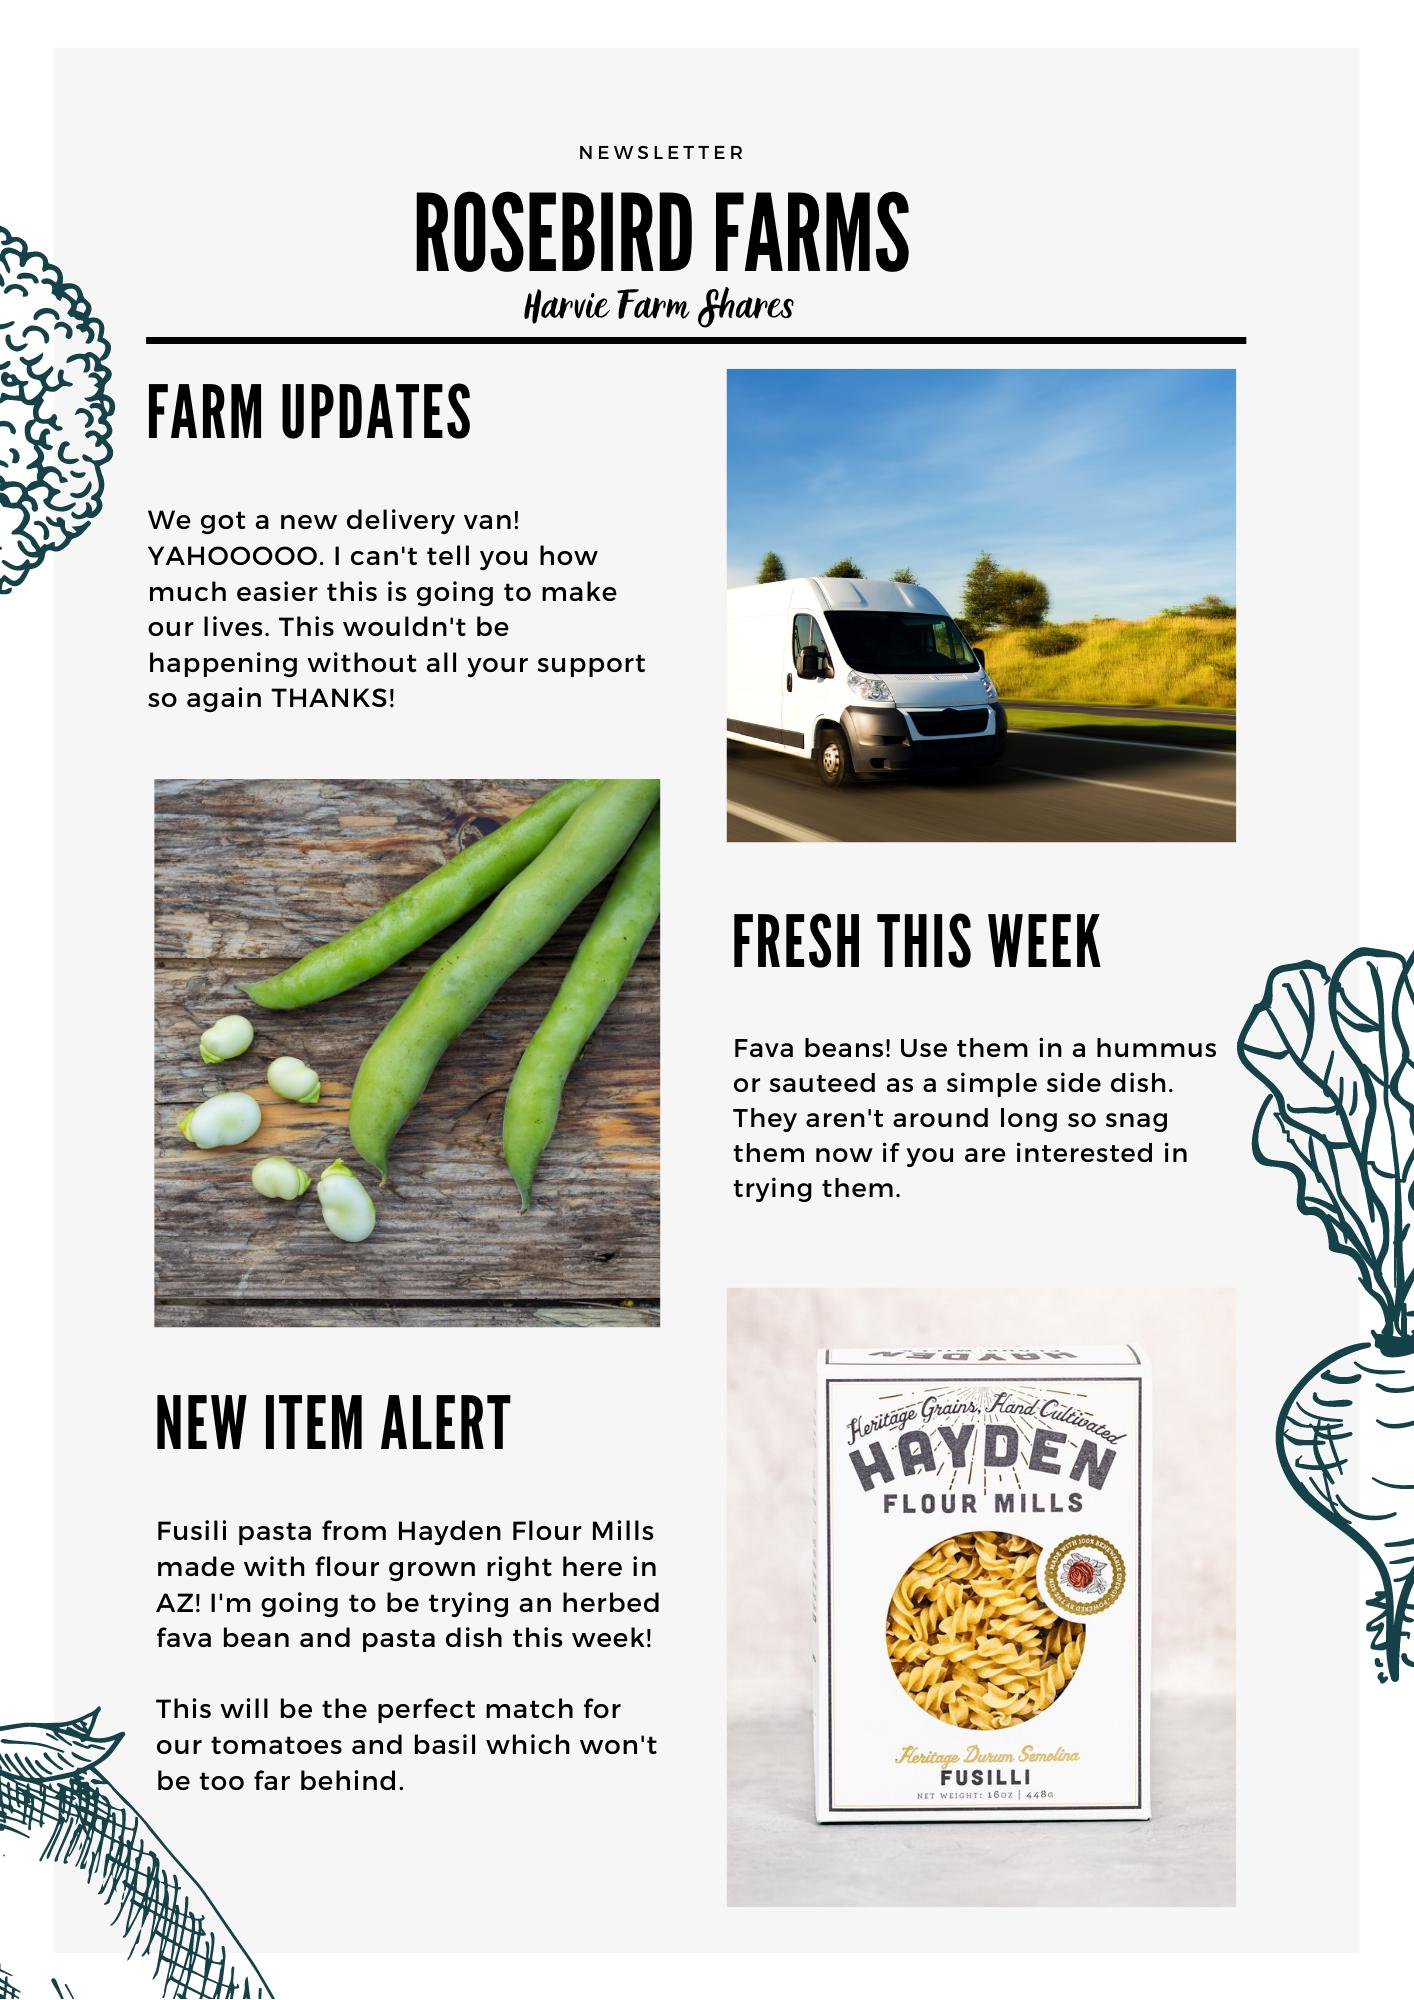 Farm Happenings for April 22, 2021